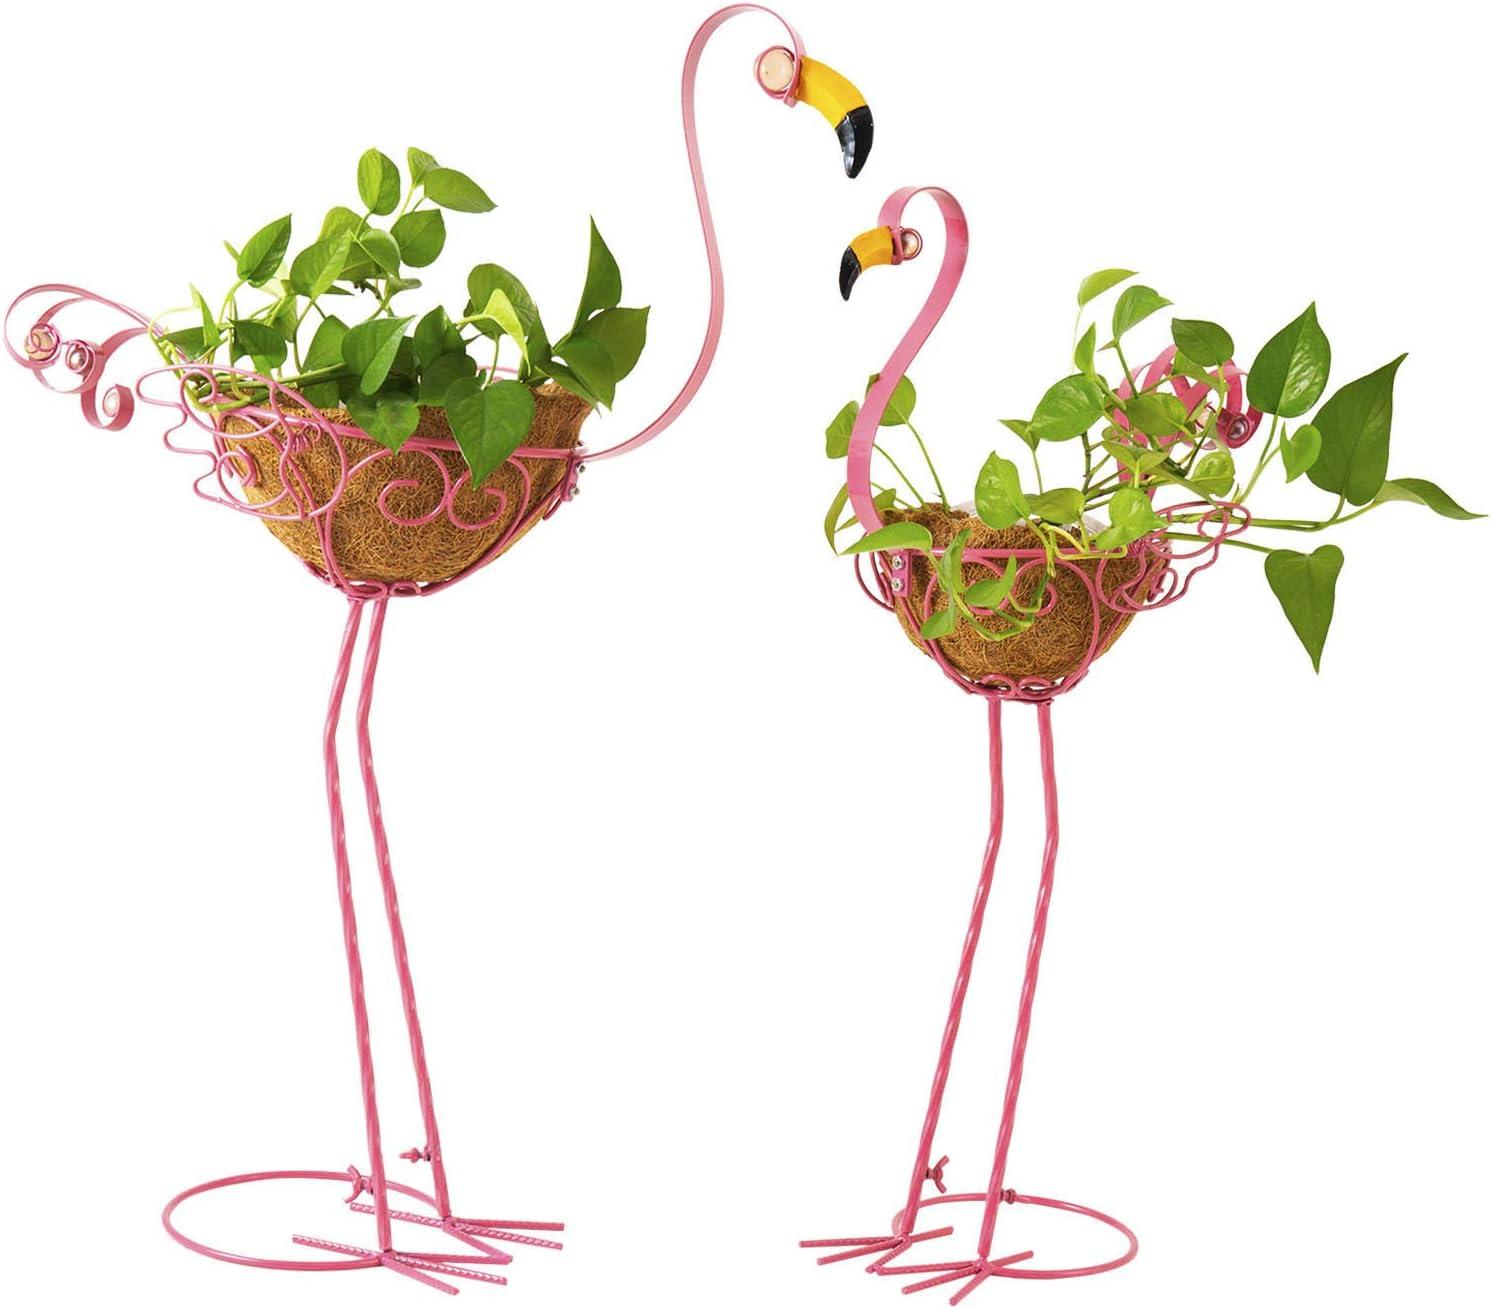 Flamingo Garden Bird Planters, Set of 2 Metal Pink Flamingos Yard Ornaments with Basket, Adorable Flamingo Gifts Outdoor Decoration for Garden, Patio, Porch, Yard